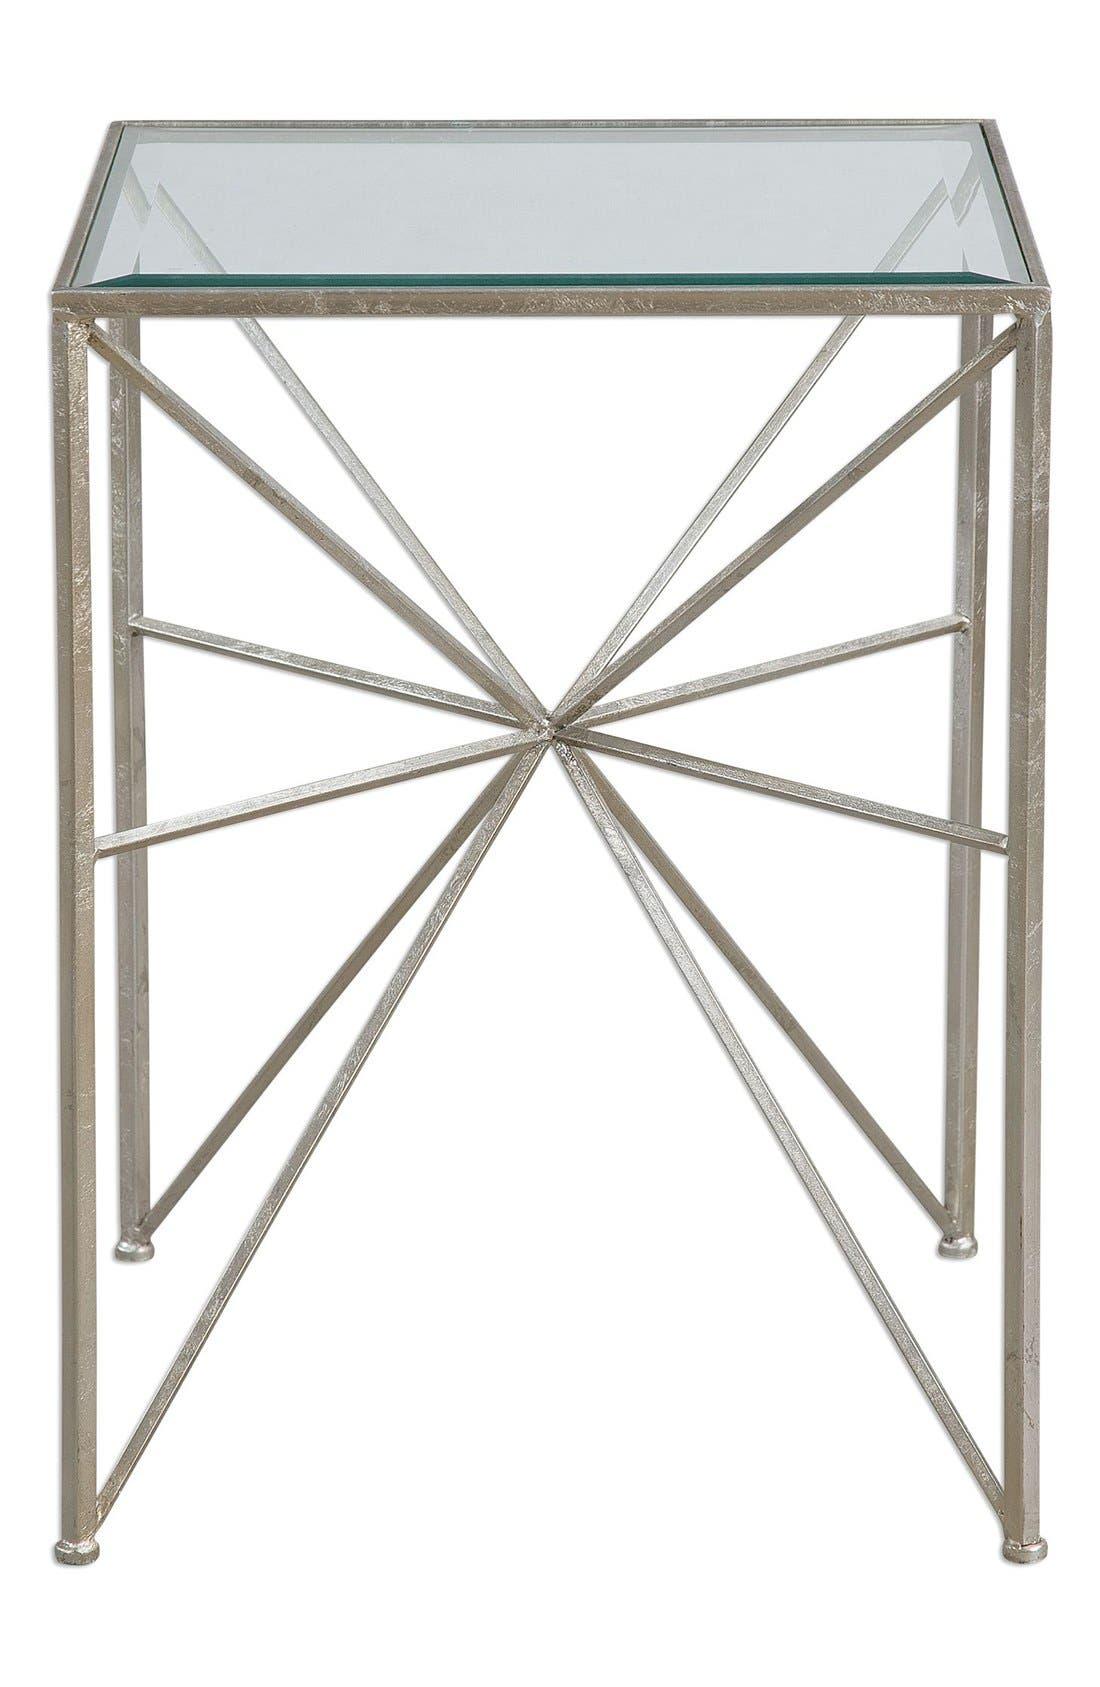 Alternate Image 1 Selected - Uttermost 'Silvana' Side Table